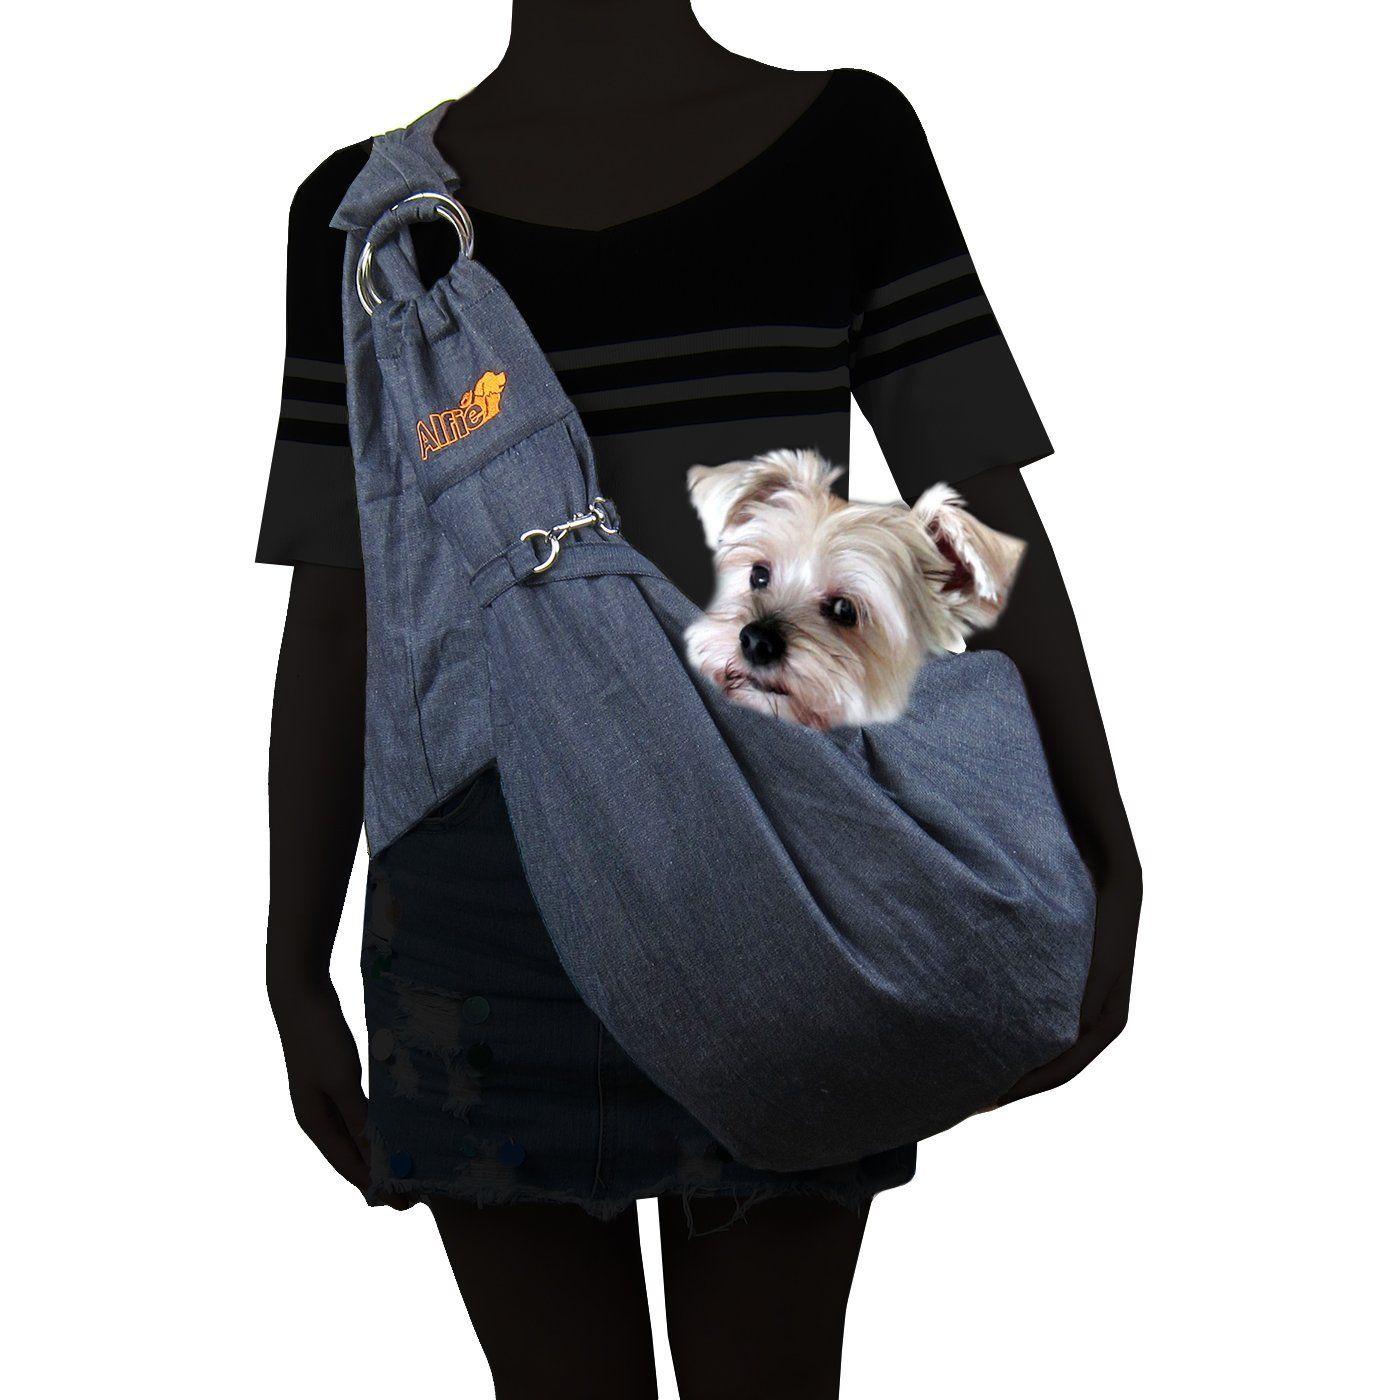 Alfie pet by petoga couture chico reversible pet sling